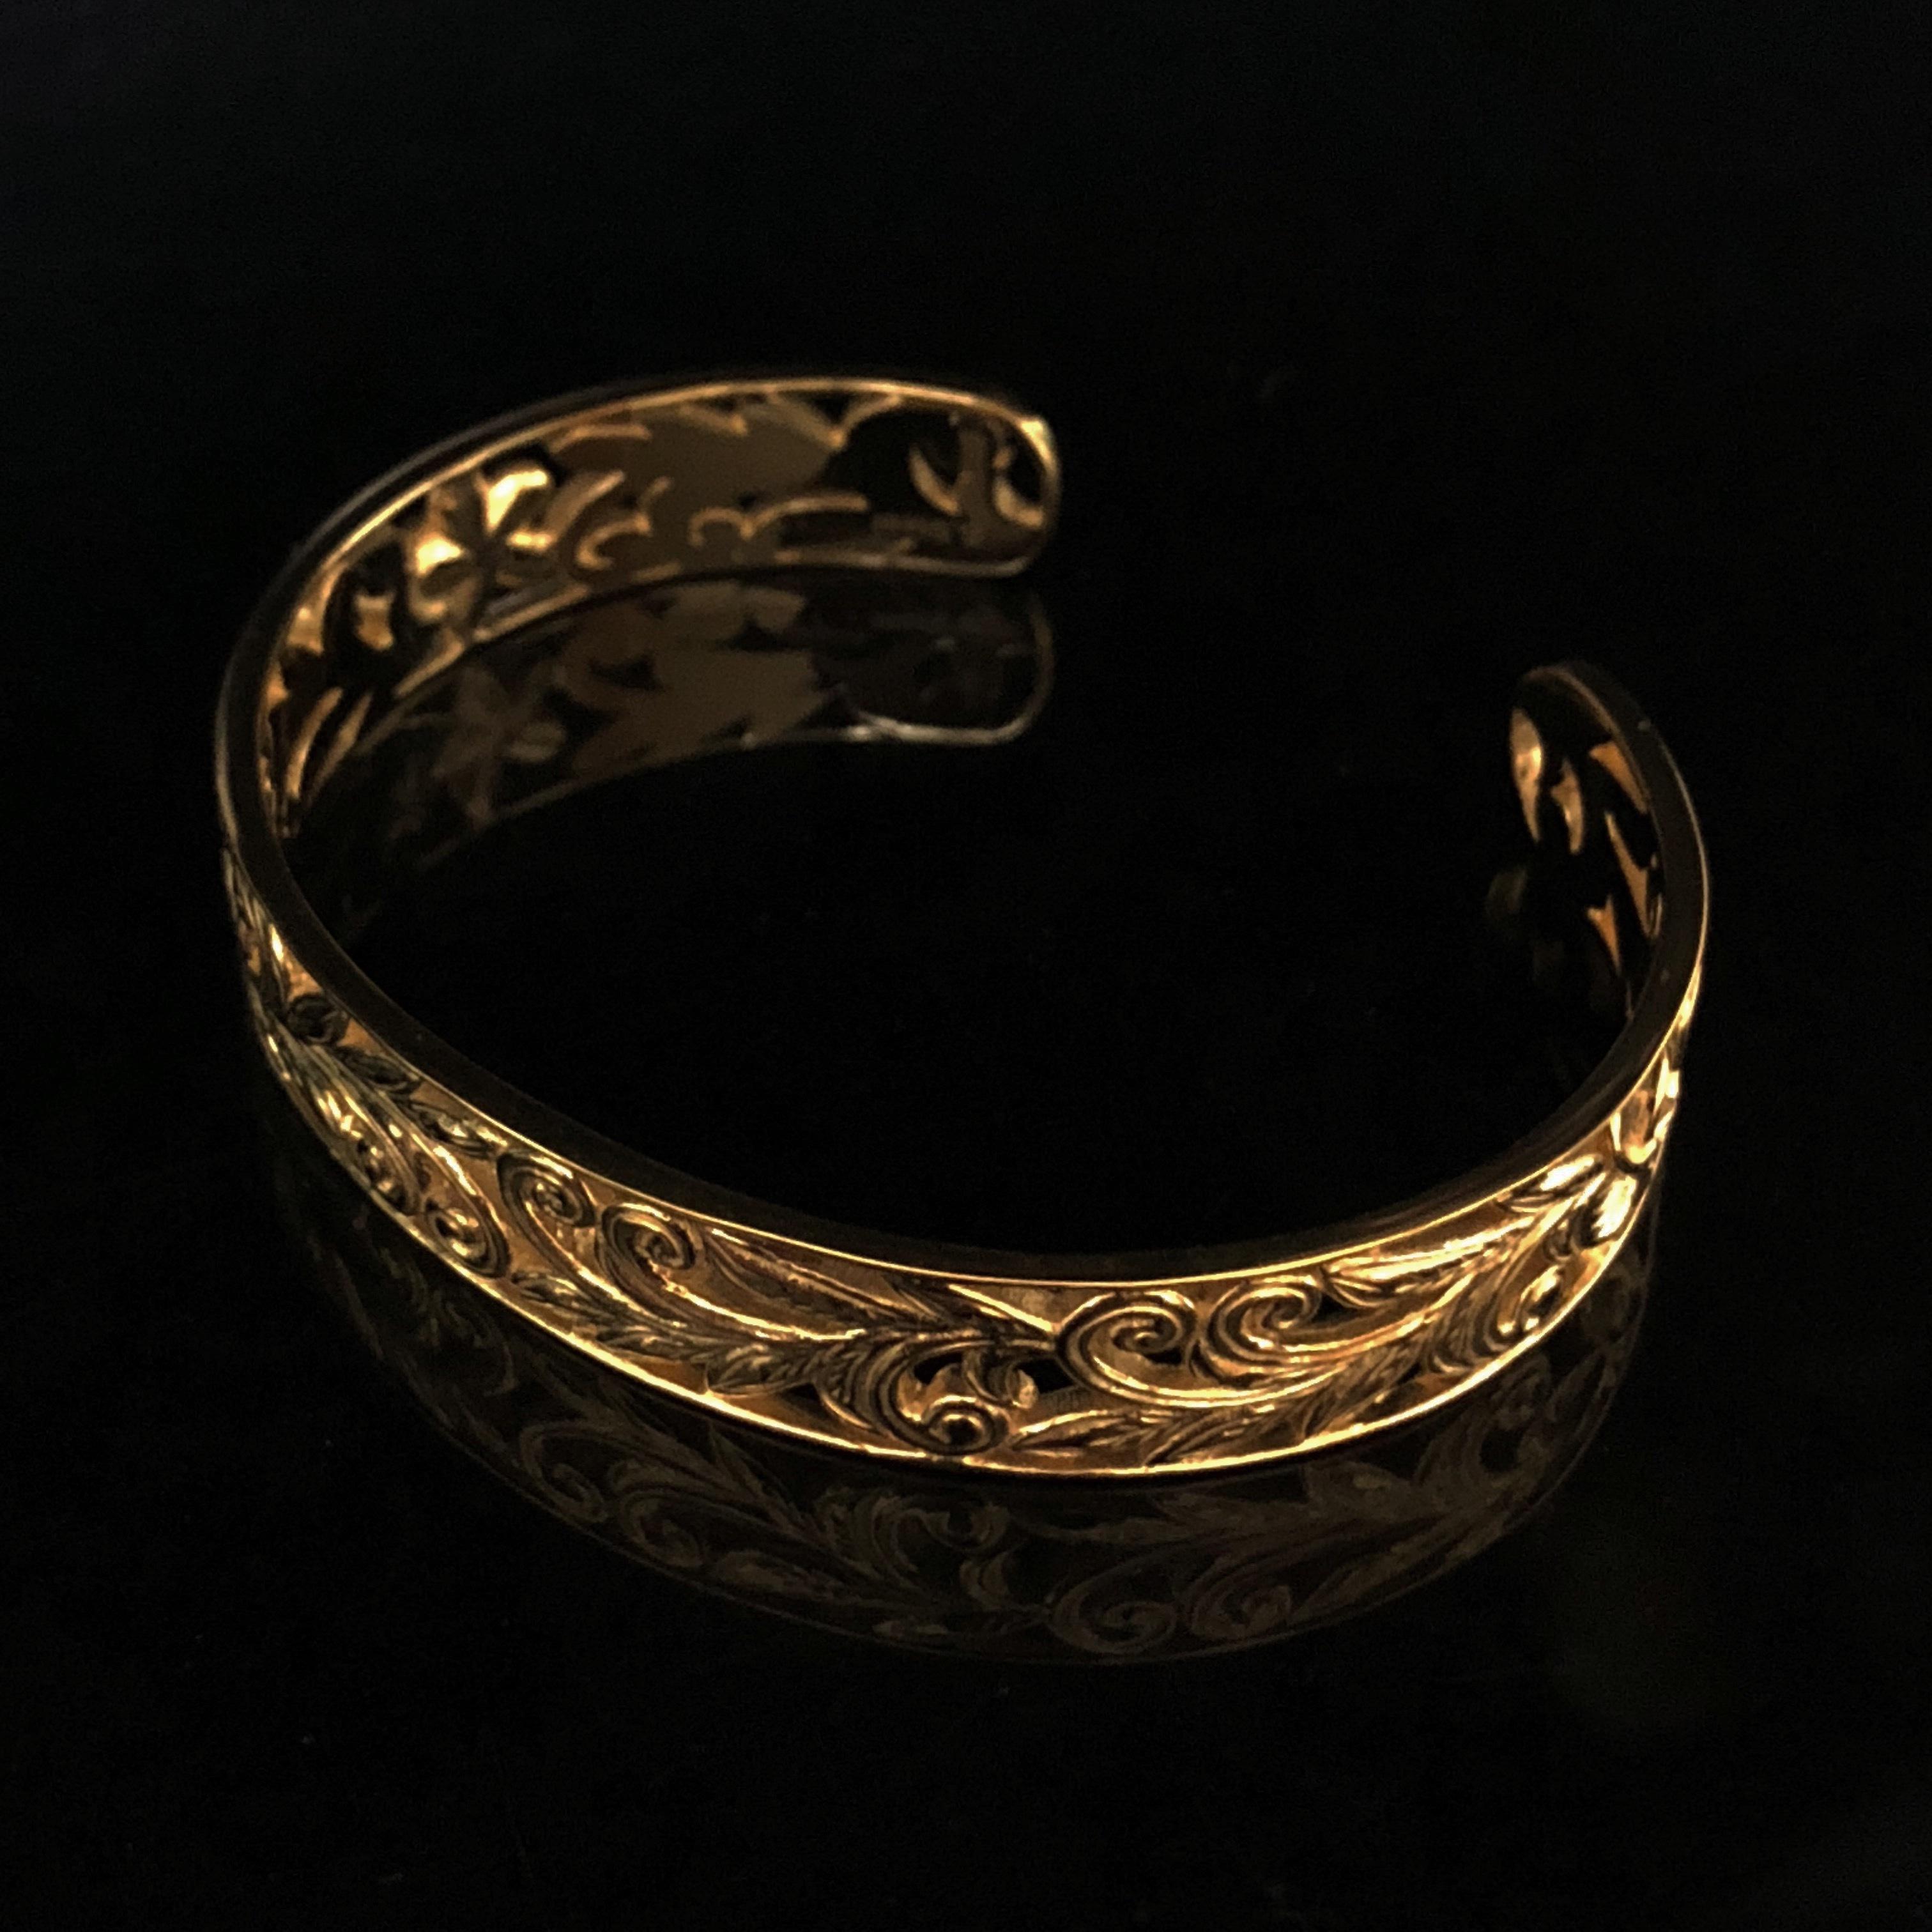 24kgp Hawaiian jewelry bangle(skeleton)